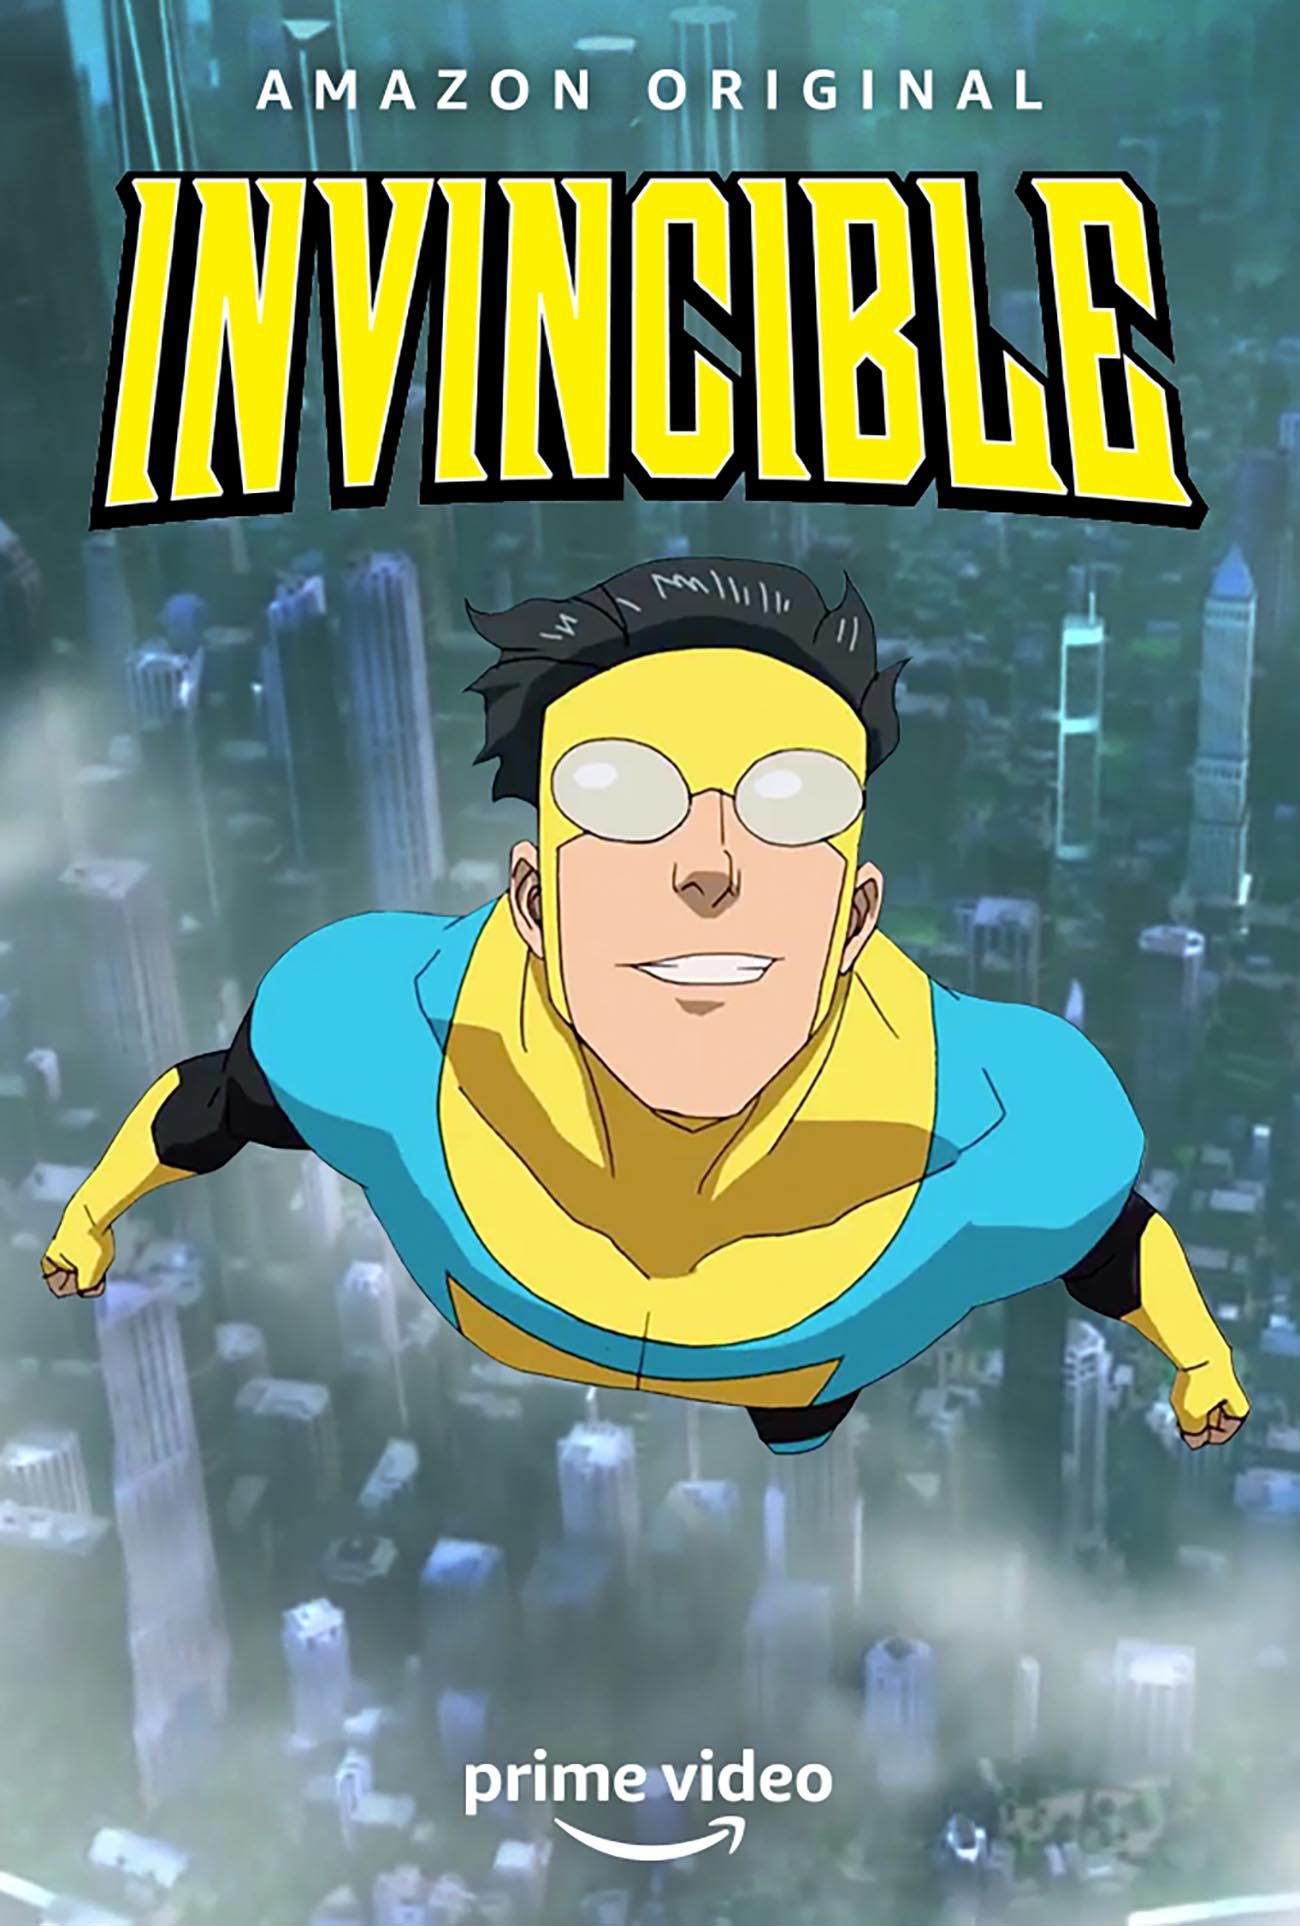 Invincible. Animación comiquera para público adolescente o adulto